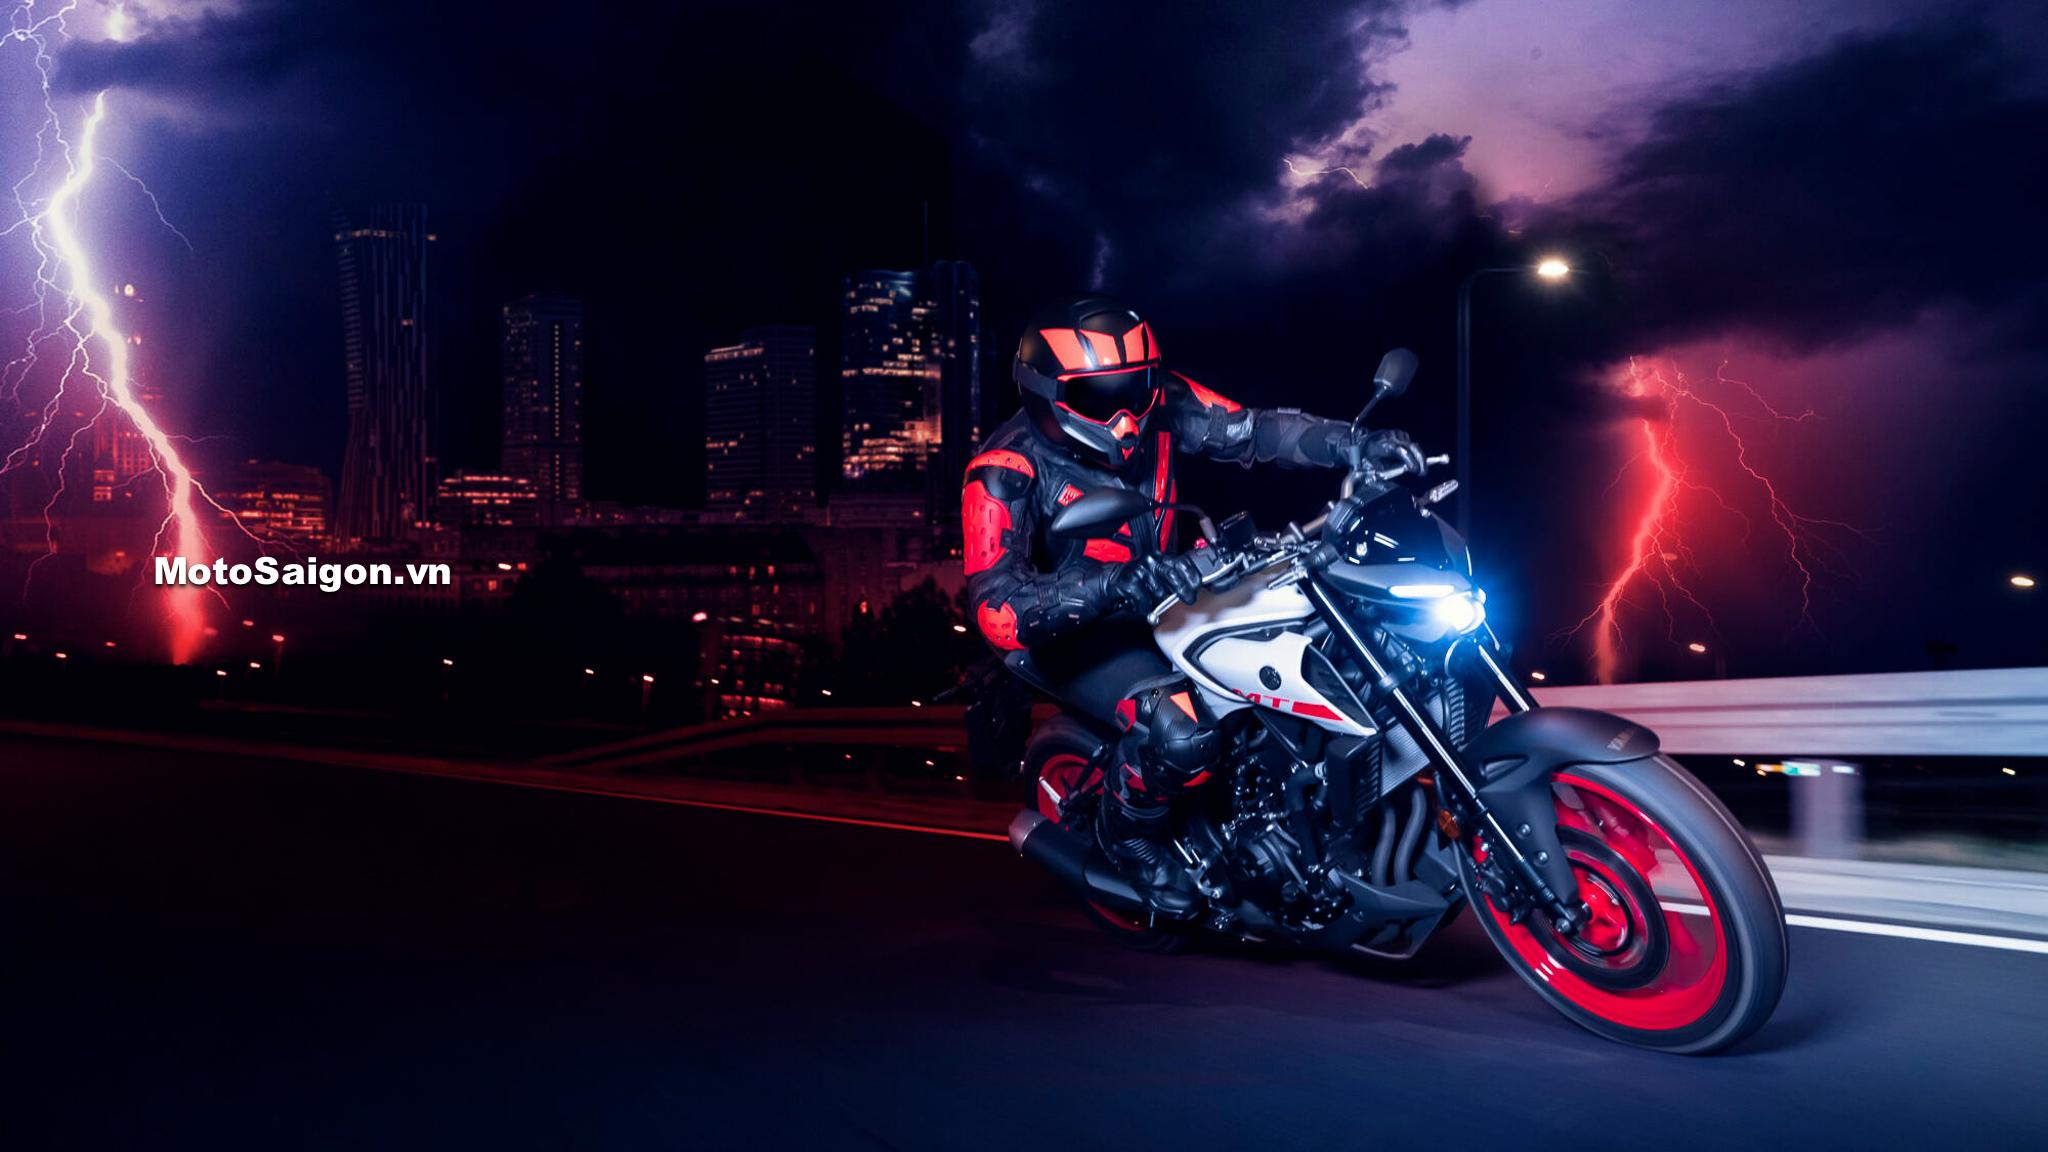 yamaha mt 03 abs 2020 danh gia xe motosaigon 8